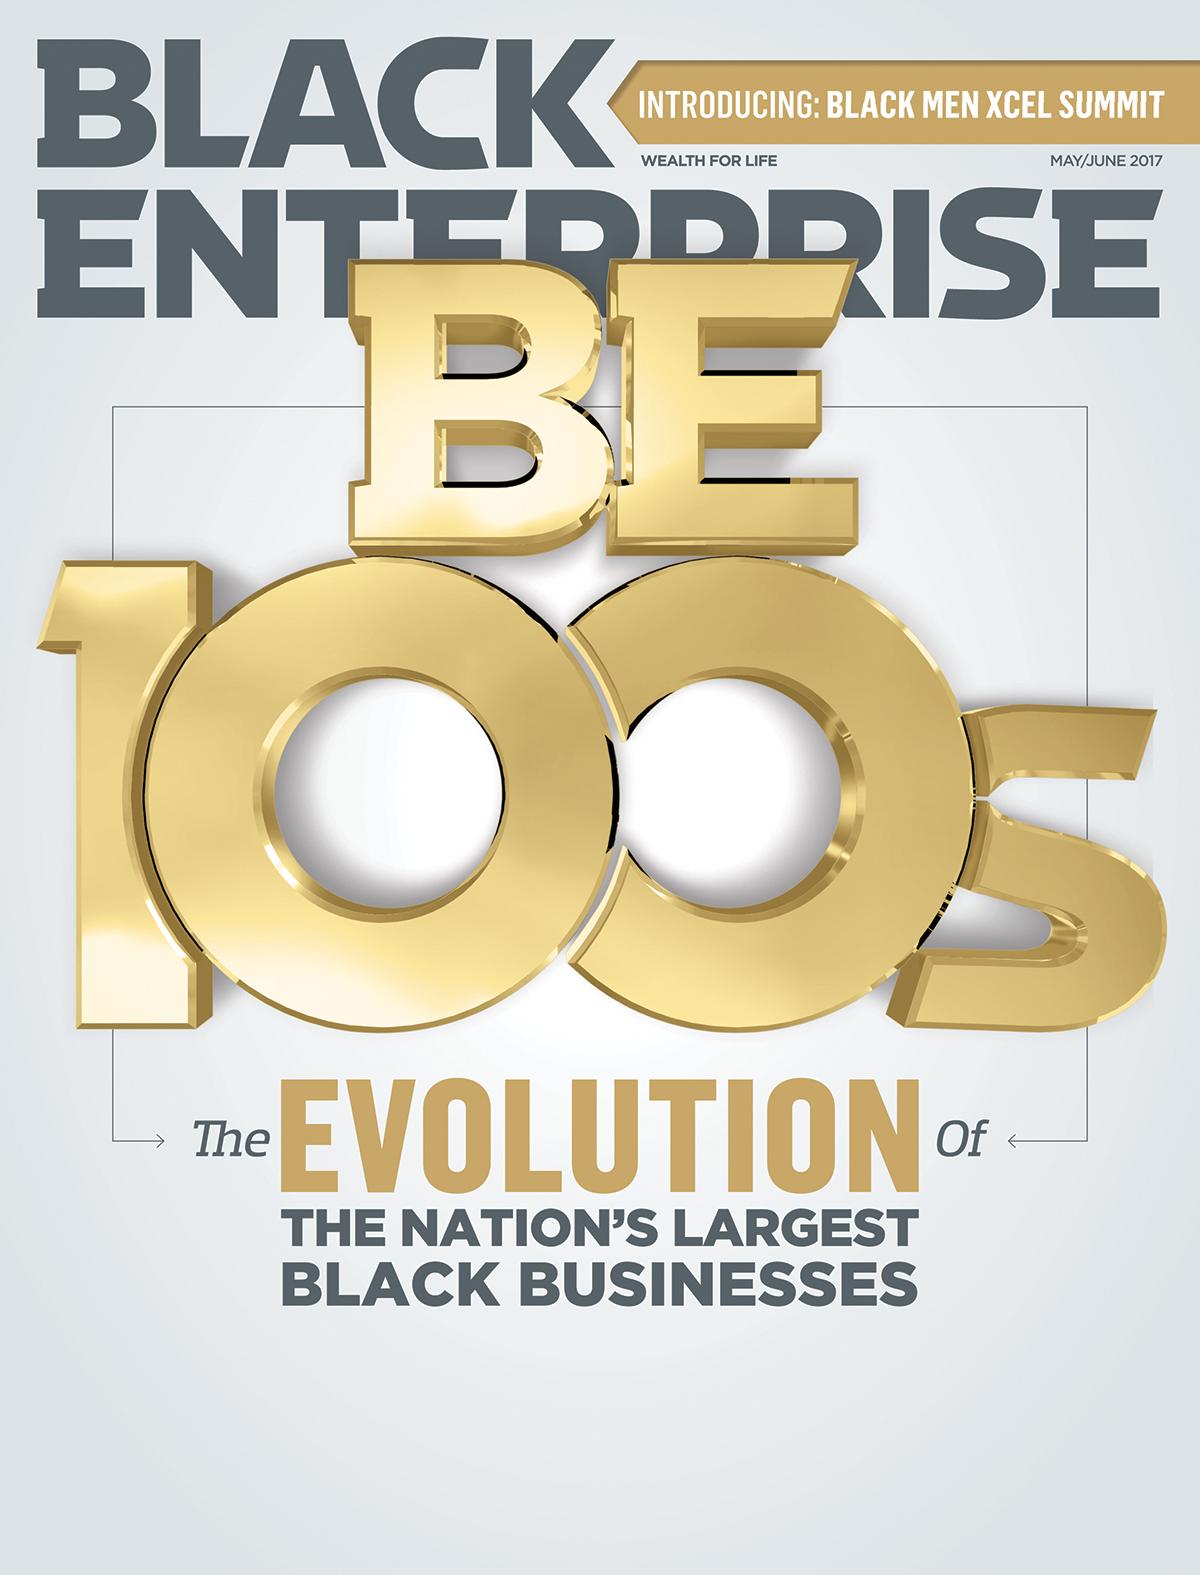 Black Enterprise magazine May/June 2017 issue